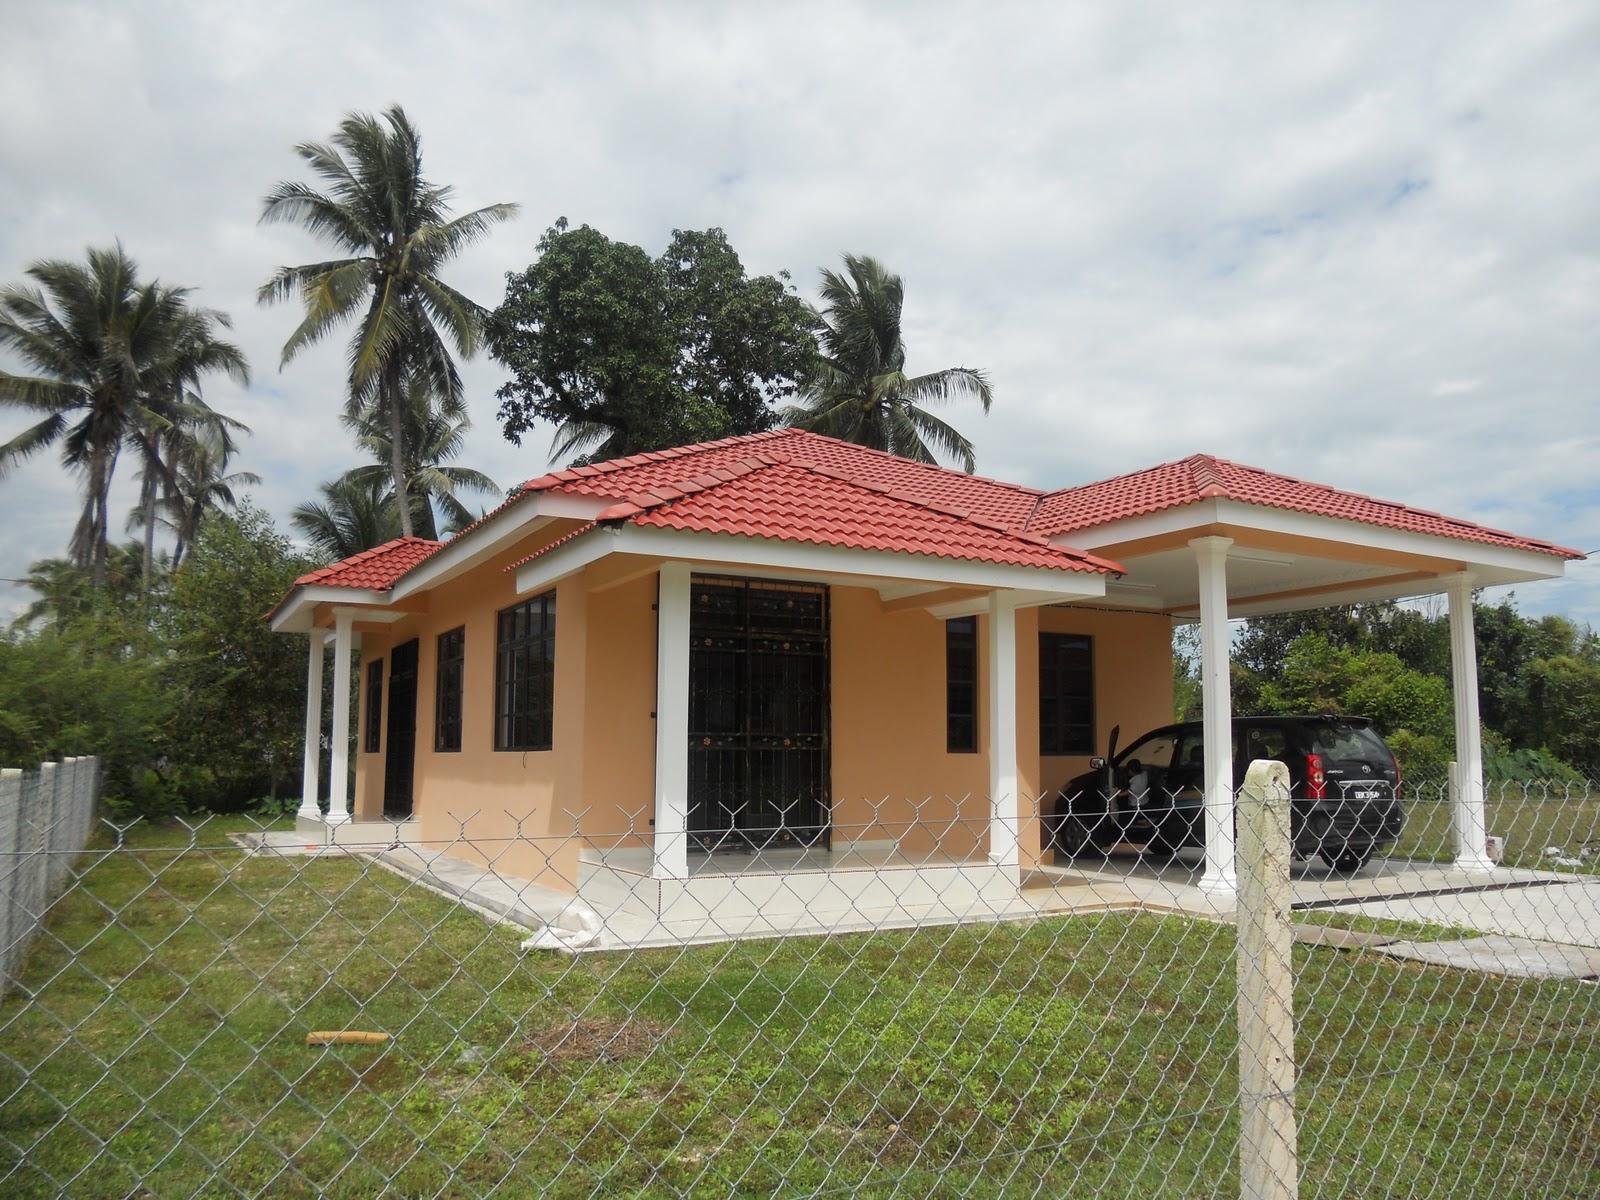 watc   h movies online Awesome 5 of Rumah Baru Untuk Dijual Melaka ~ Apr ...